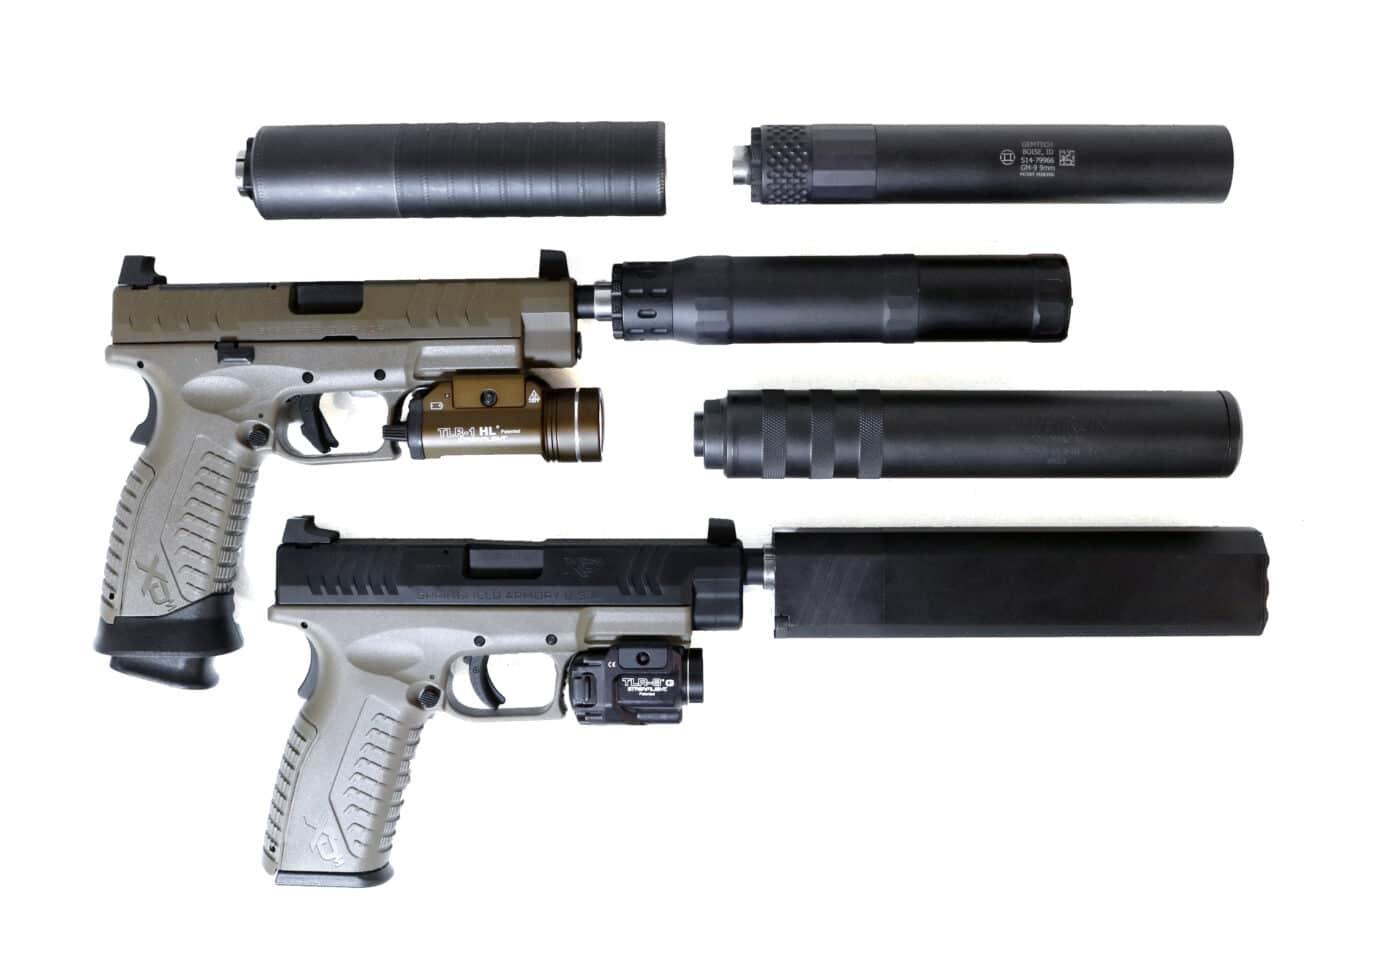 .45 ACP suppressor on 9mm pistol